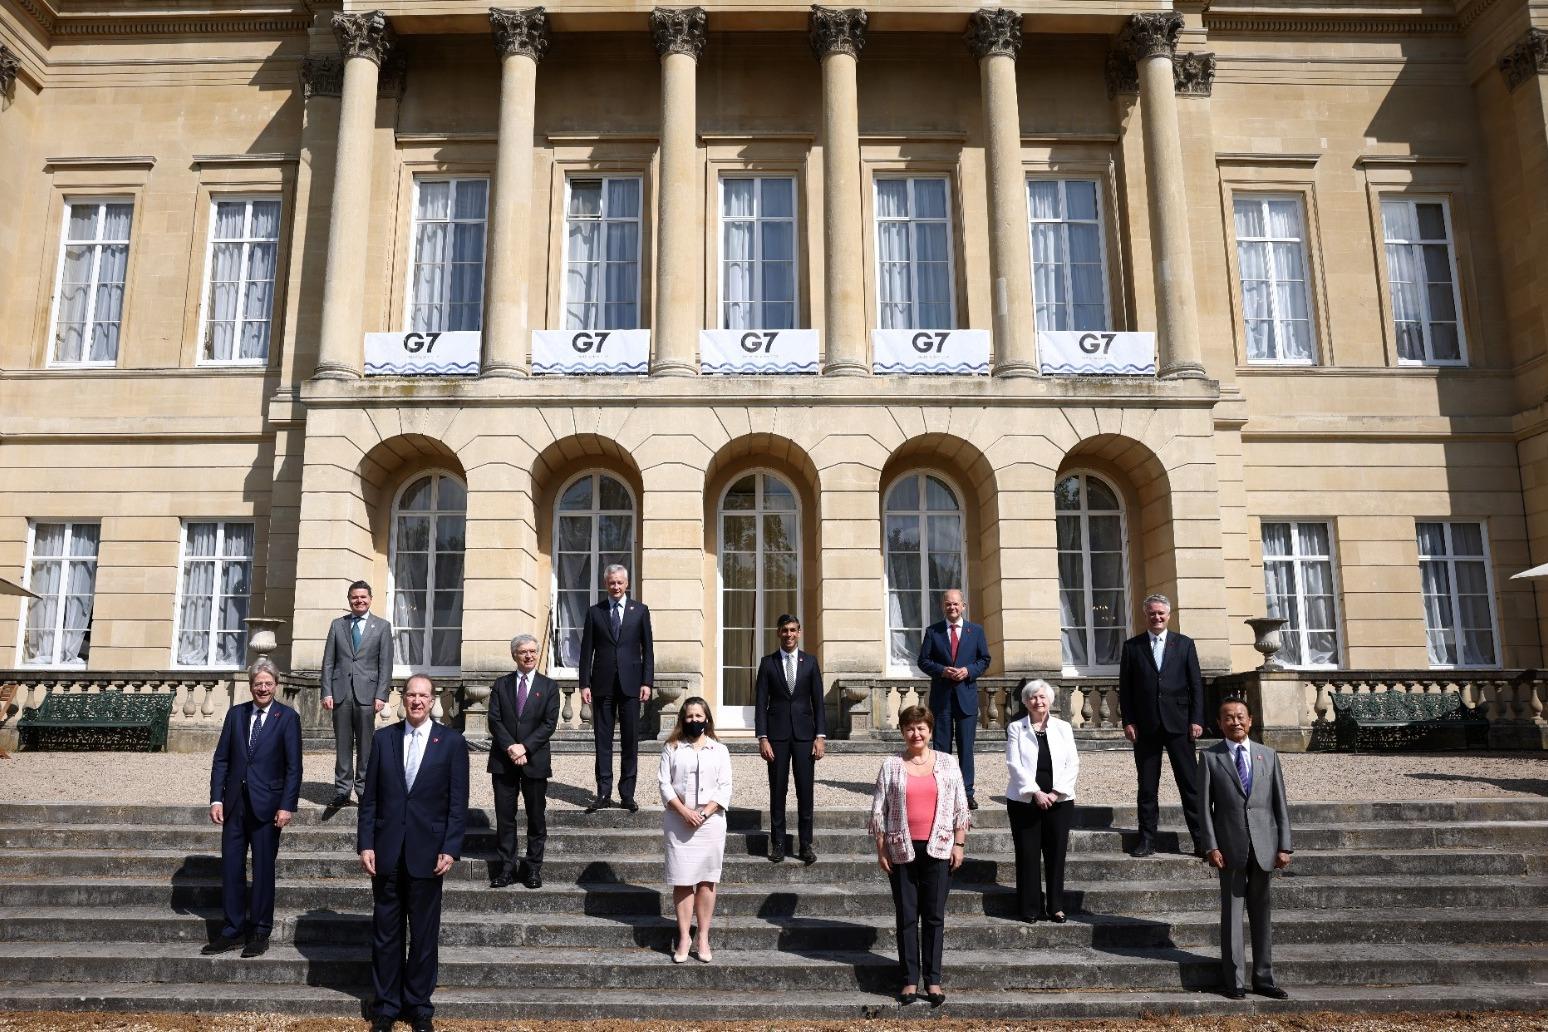 Chancellor heralds 'historic' tax deal at G7 finance meeting